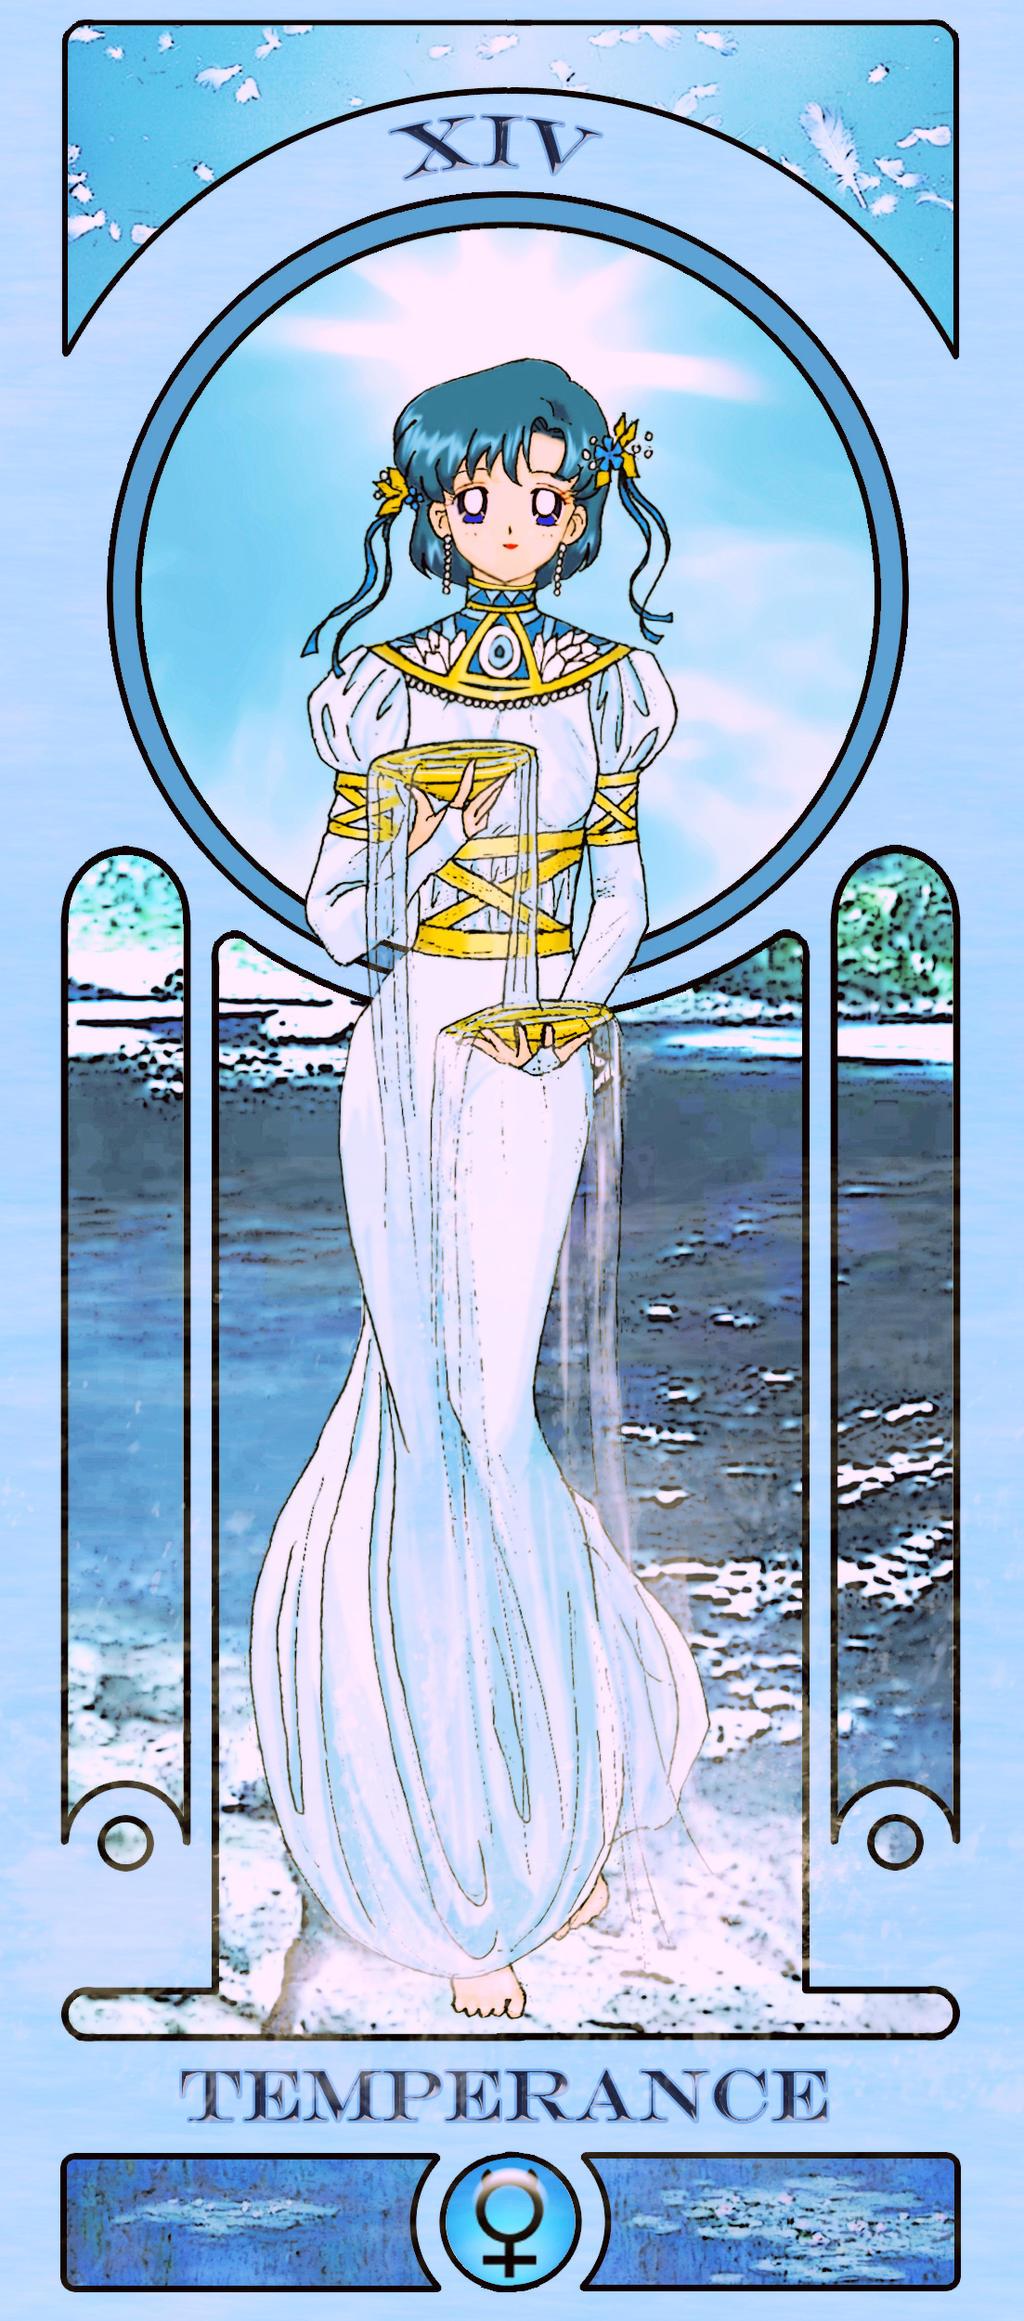 Xiv Temperance Balance Archangel Zadkiel: Temperance By Sillabub429 On DeviantArt